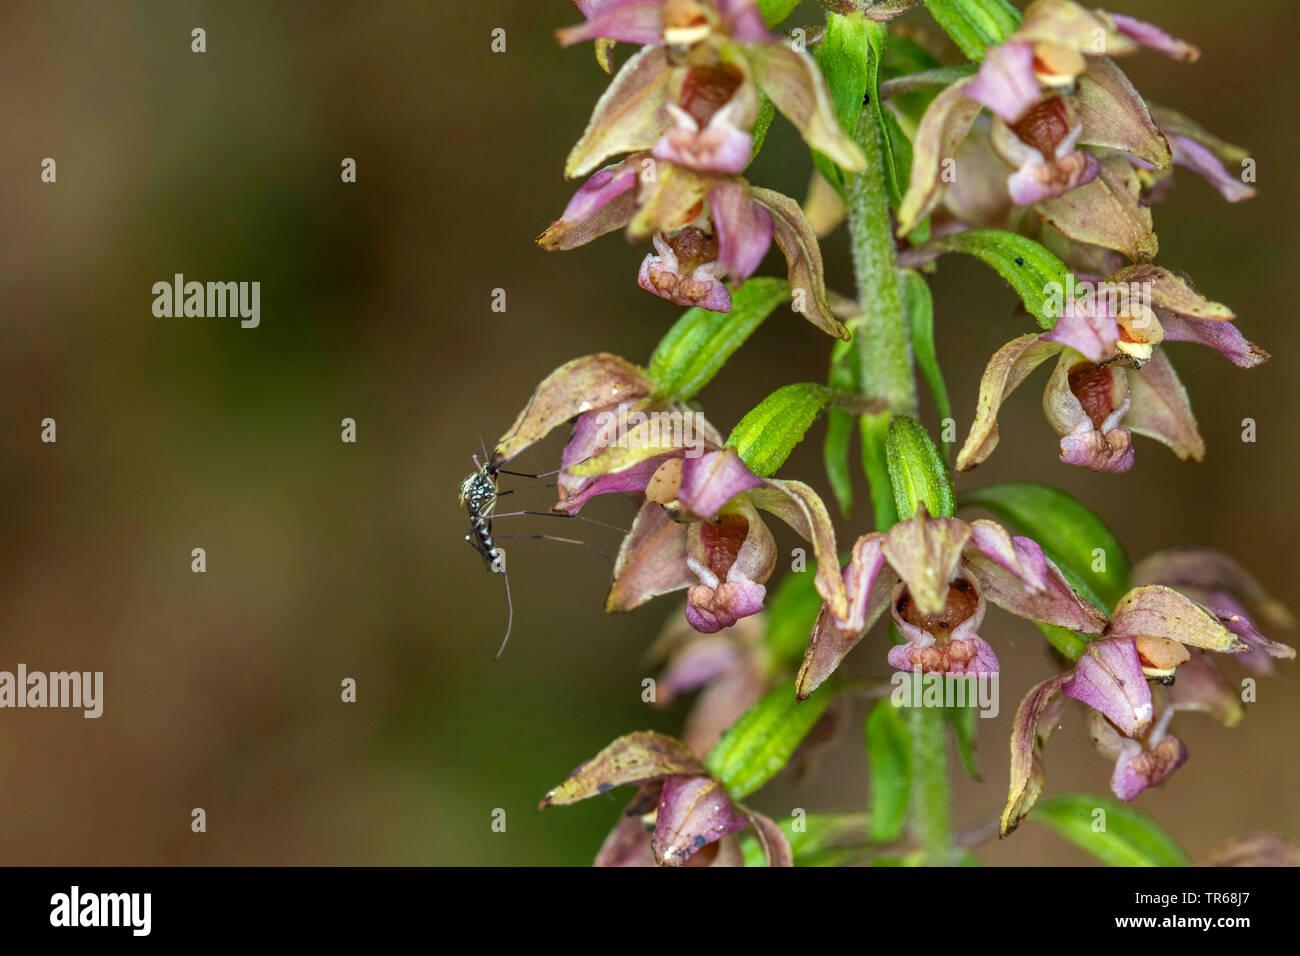 Broad-leaved helleborine, Eastern helleborine (Epipactis helleborine), inland floodwater mosquito, Aedes vexans, on a flower, Germany, Mecklenburg-Western Pomerania Stock Photo